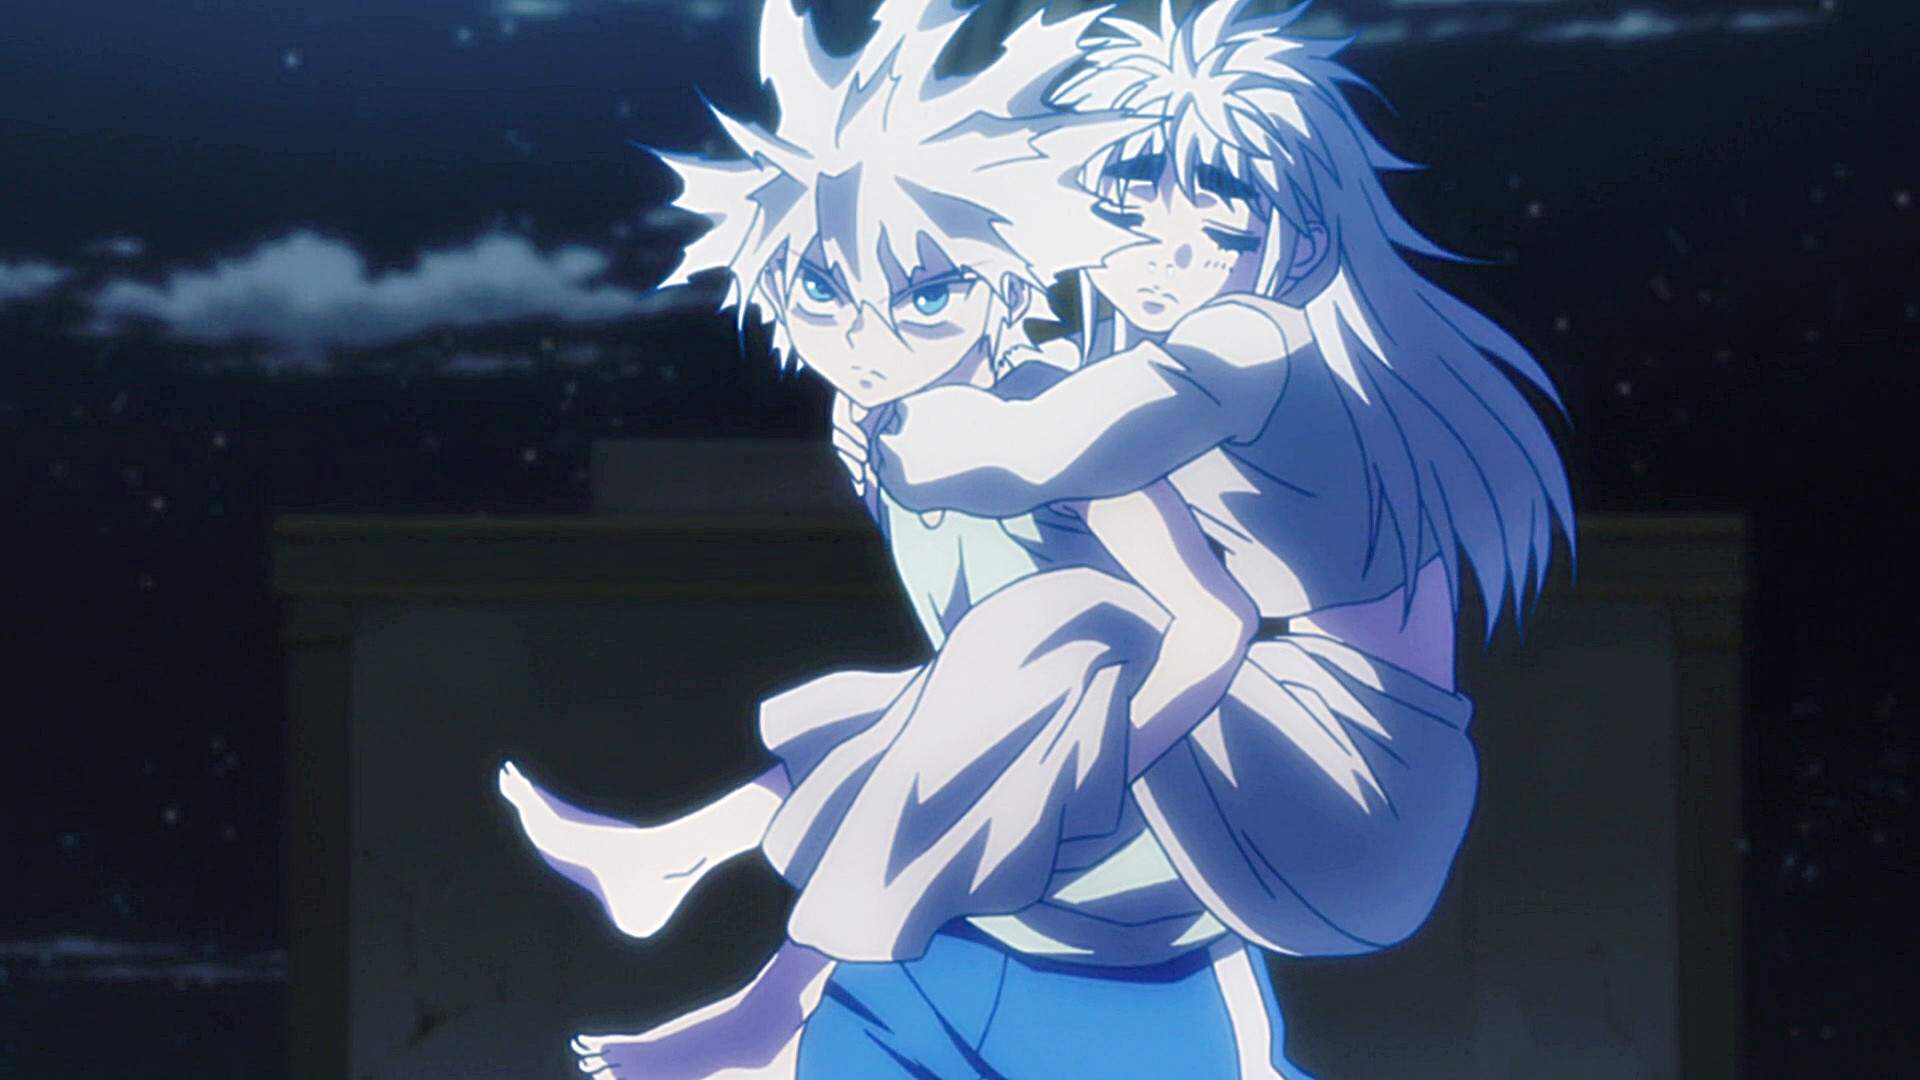 Komugi images Godspeed Killua HD wallpaper and background photos